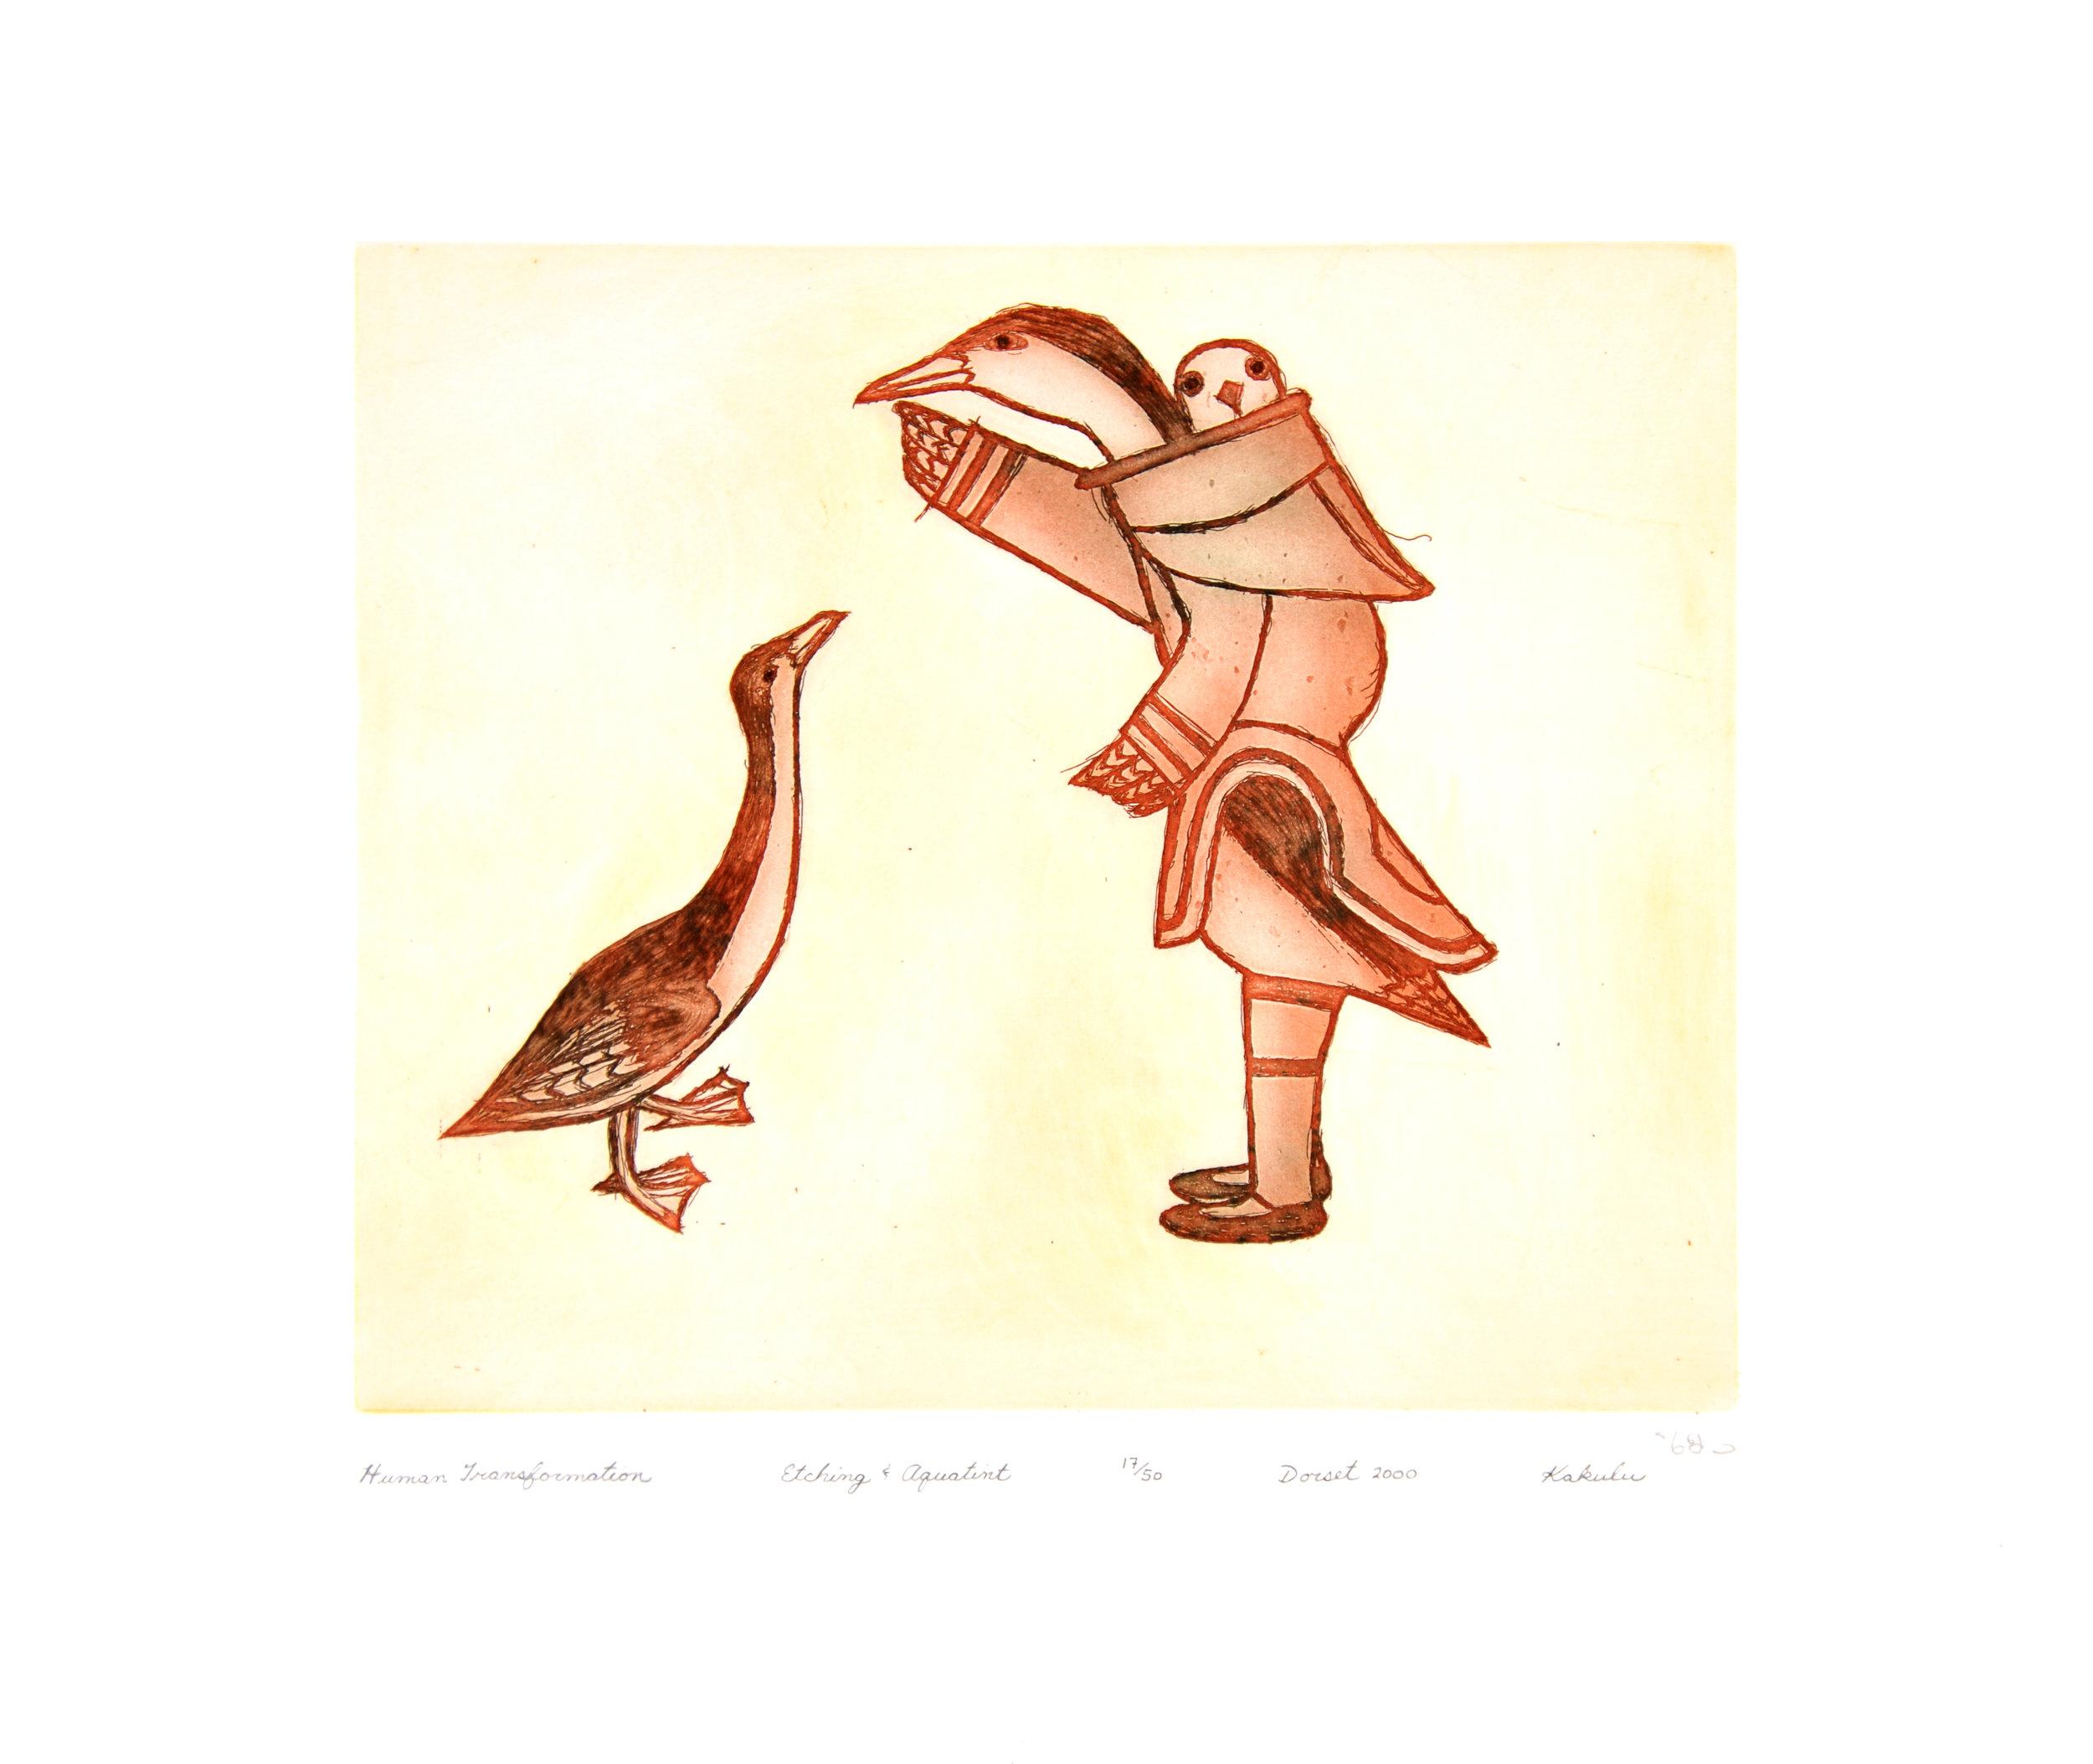 Kakulu Saggiaktok  HUMAN TRANSFORMATION Etching & Aquatint 2000 40 x 47.5 cm $350.00 CDN Released in the 2000 Spring collection Dorset ID#: 2000-S05